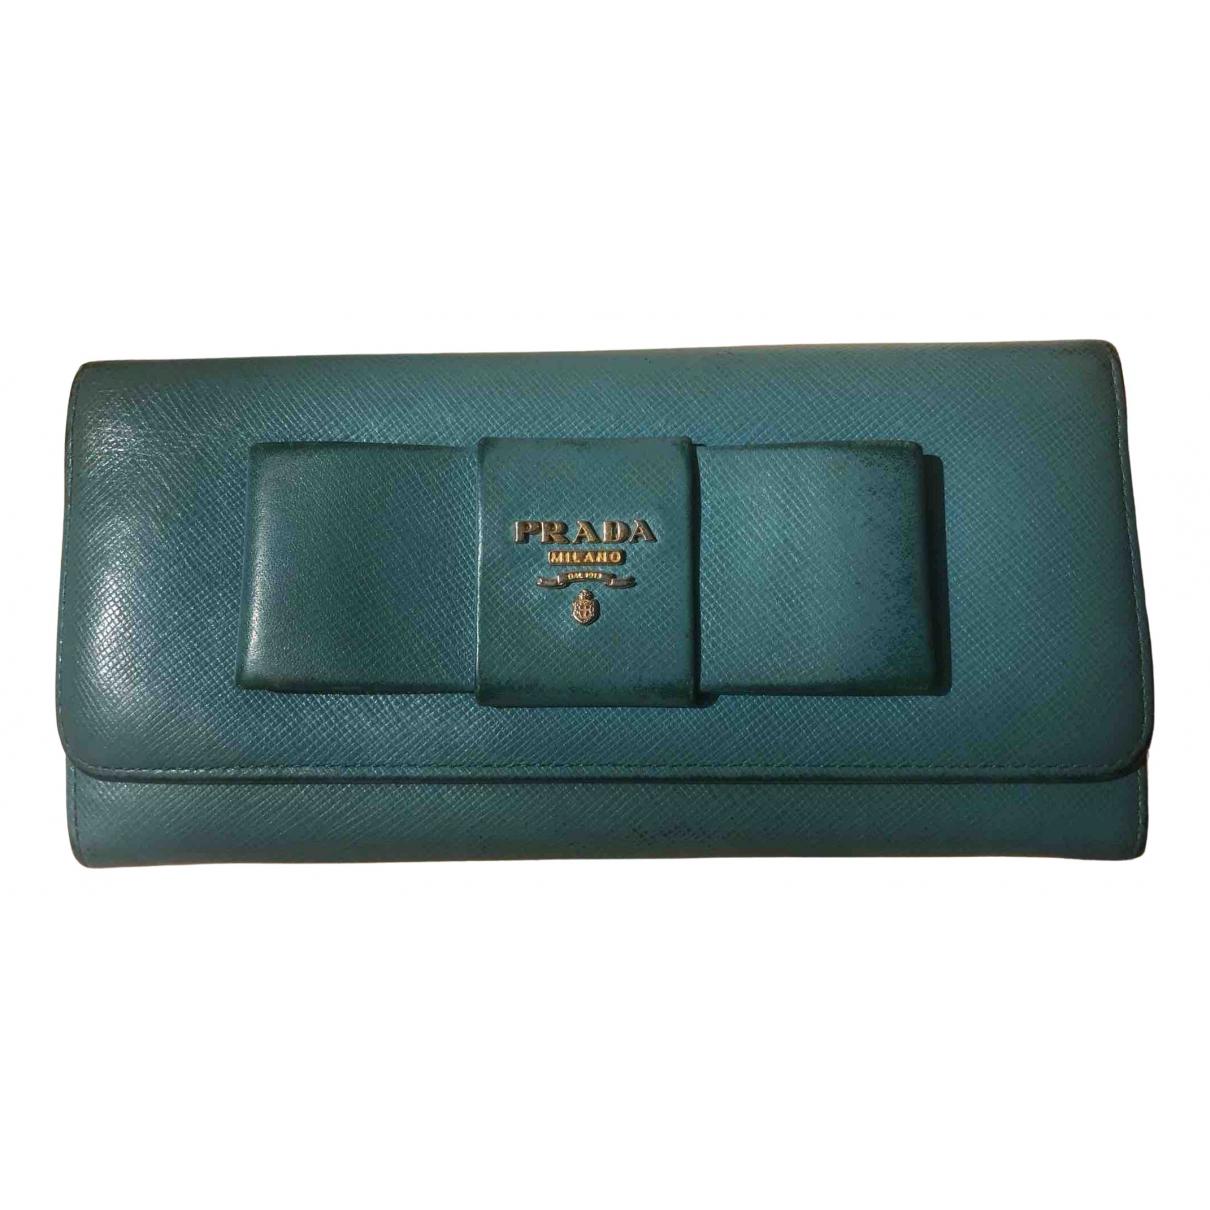 Prada N Turquoise Leather wallet for Women N